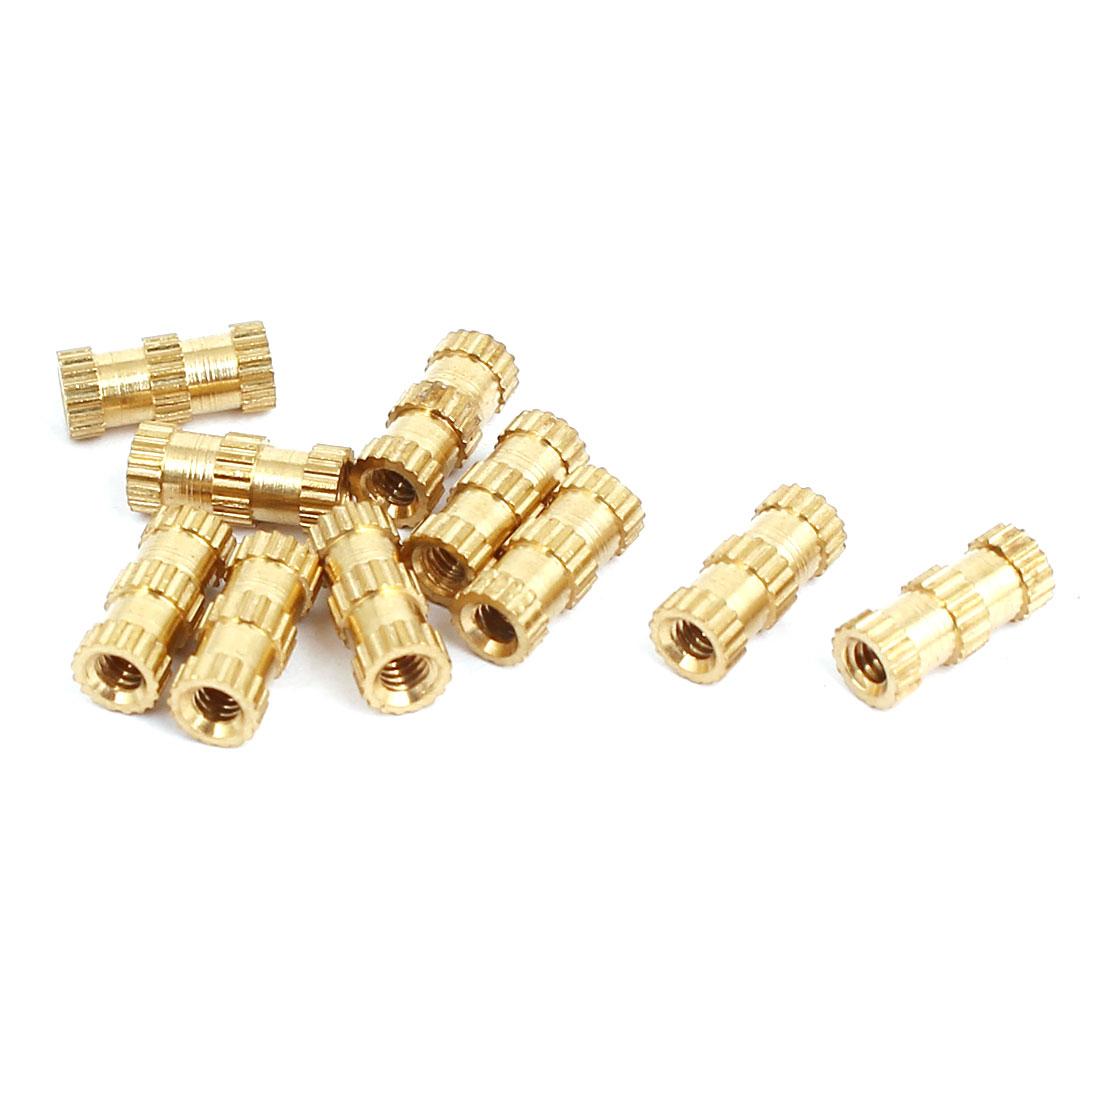 M2x8mmx3.5mm Brass Knurled Threaded Nut Insert Embedded Nuts Gold Tone 10pcs